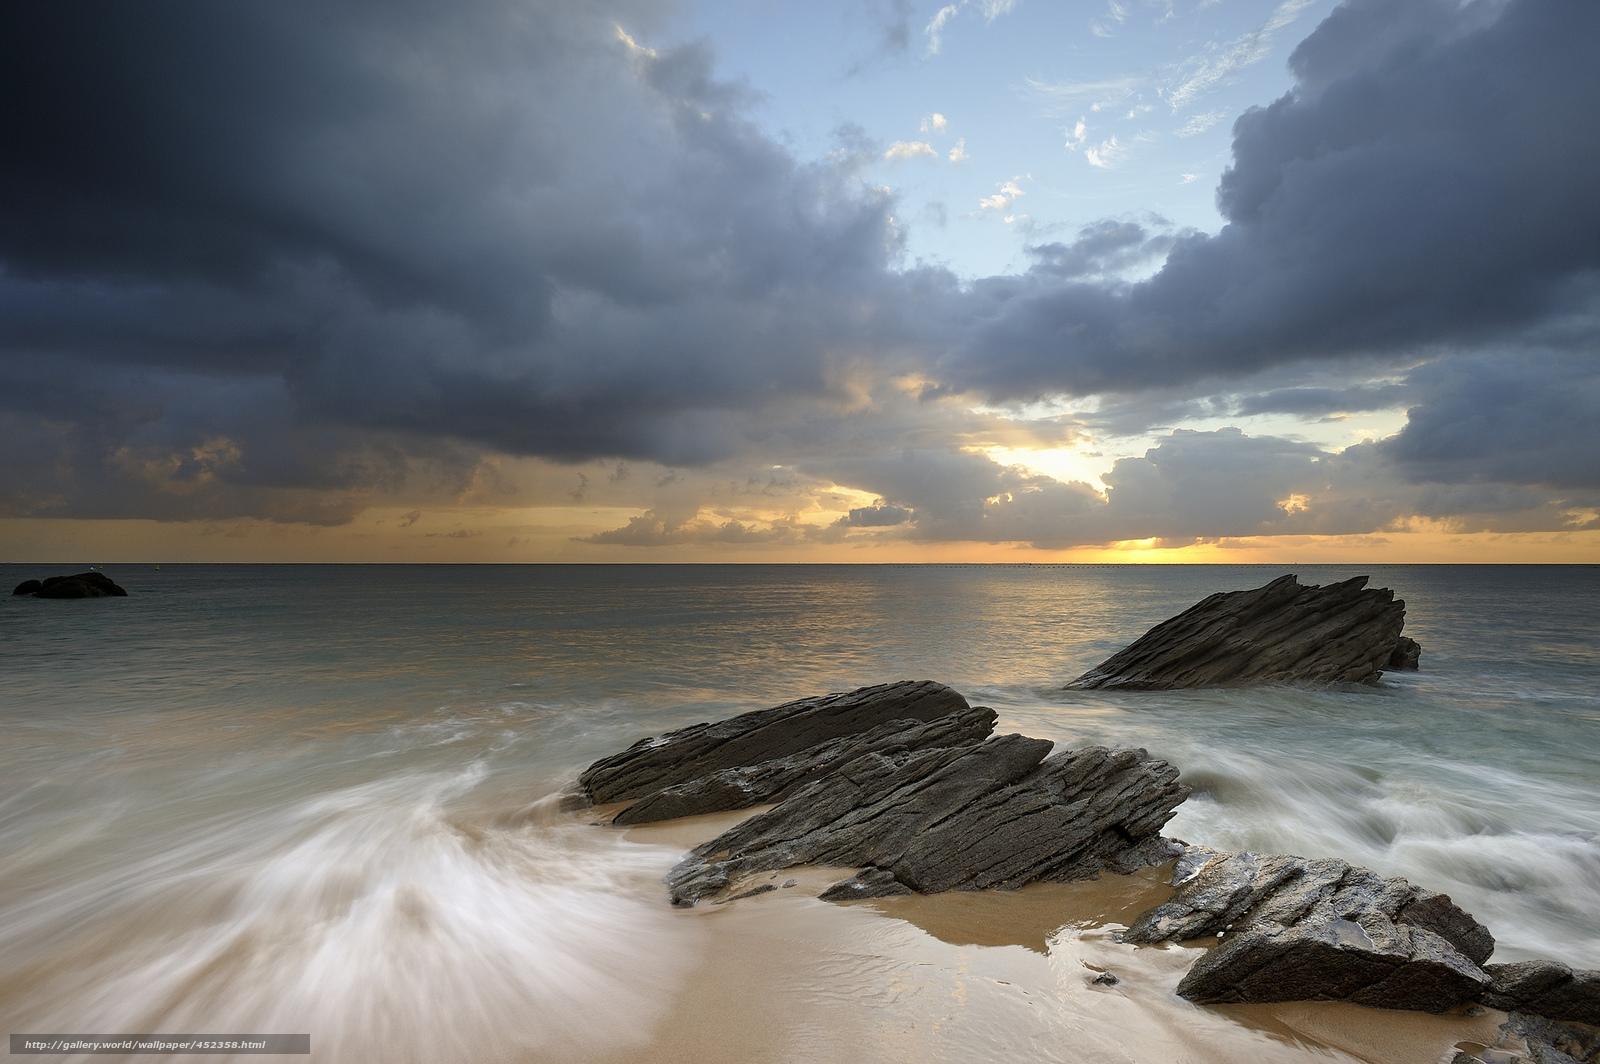 wallpaper splashback more coast - photo #35